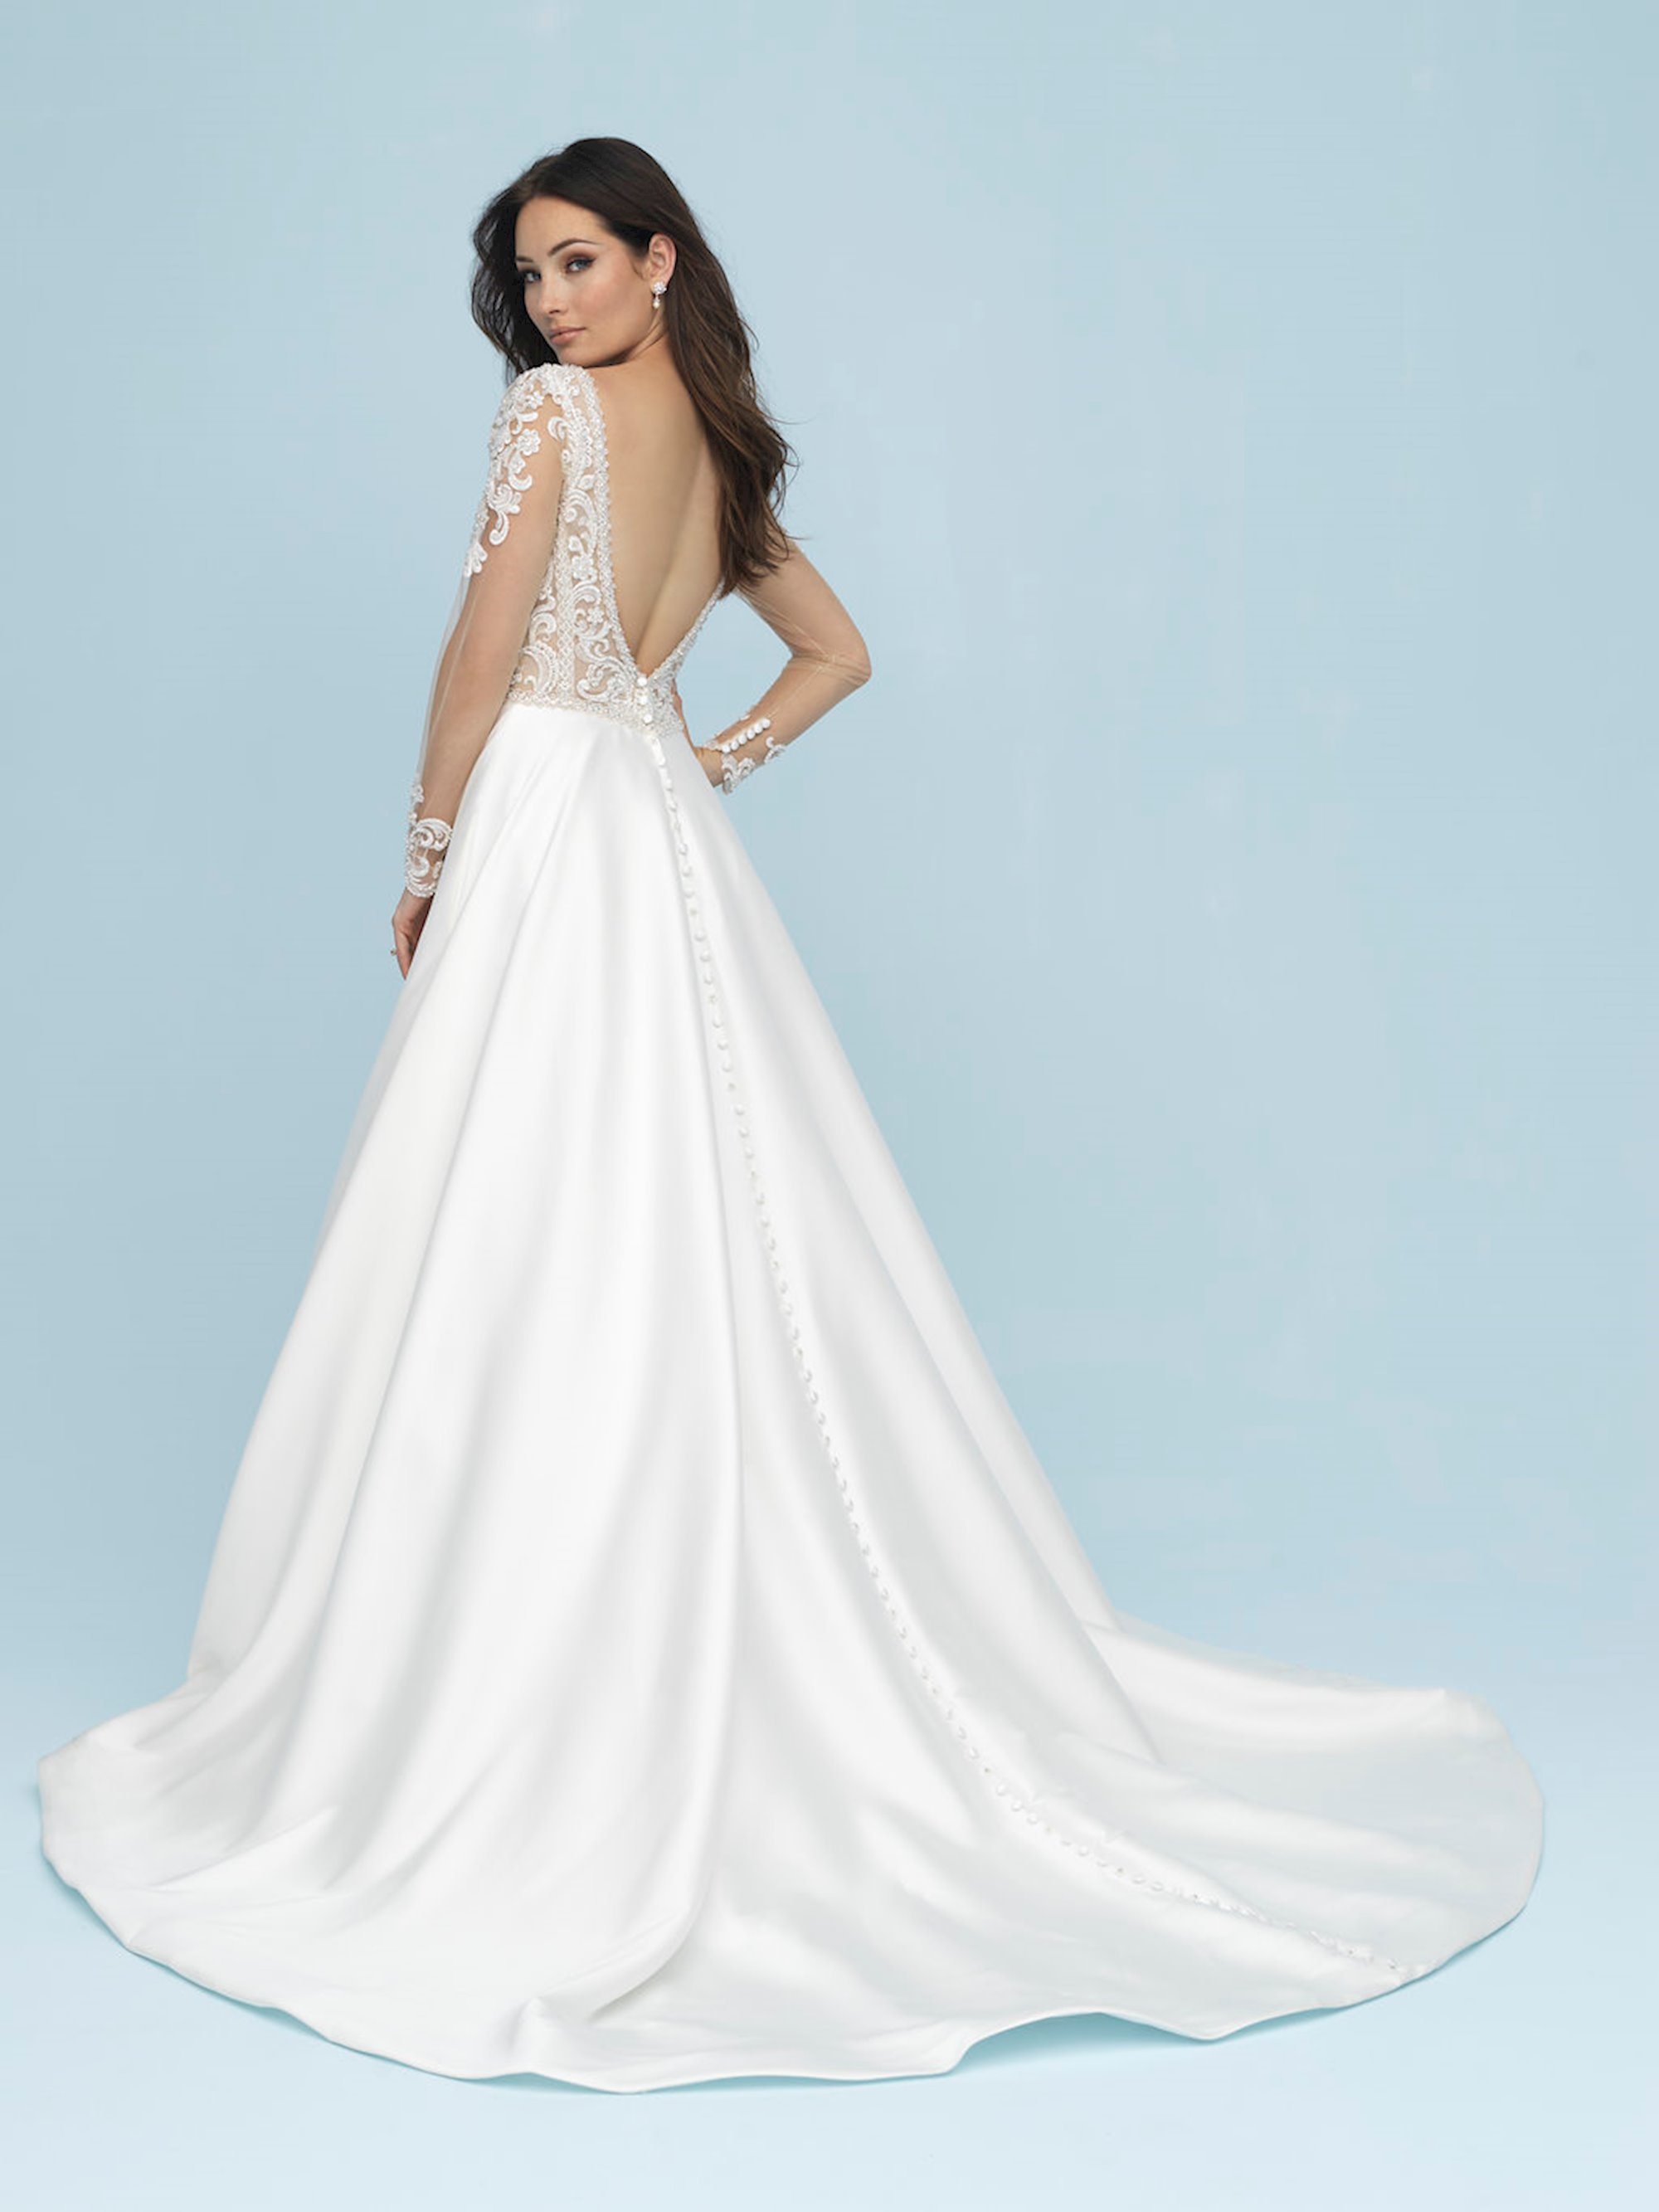 81ef1f23ed1c5 Allure Bridals - 9614 | Amanda's Touch Bridal and Formal